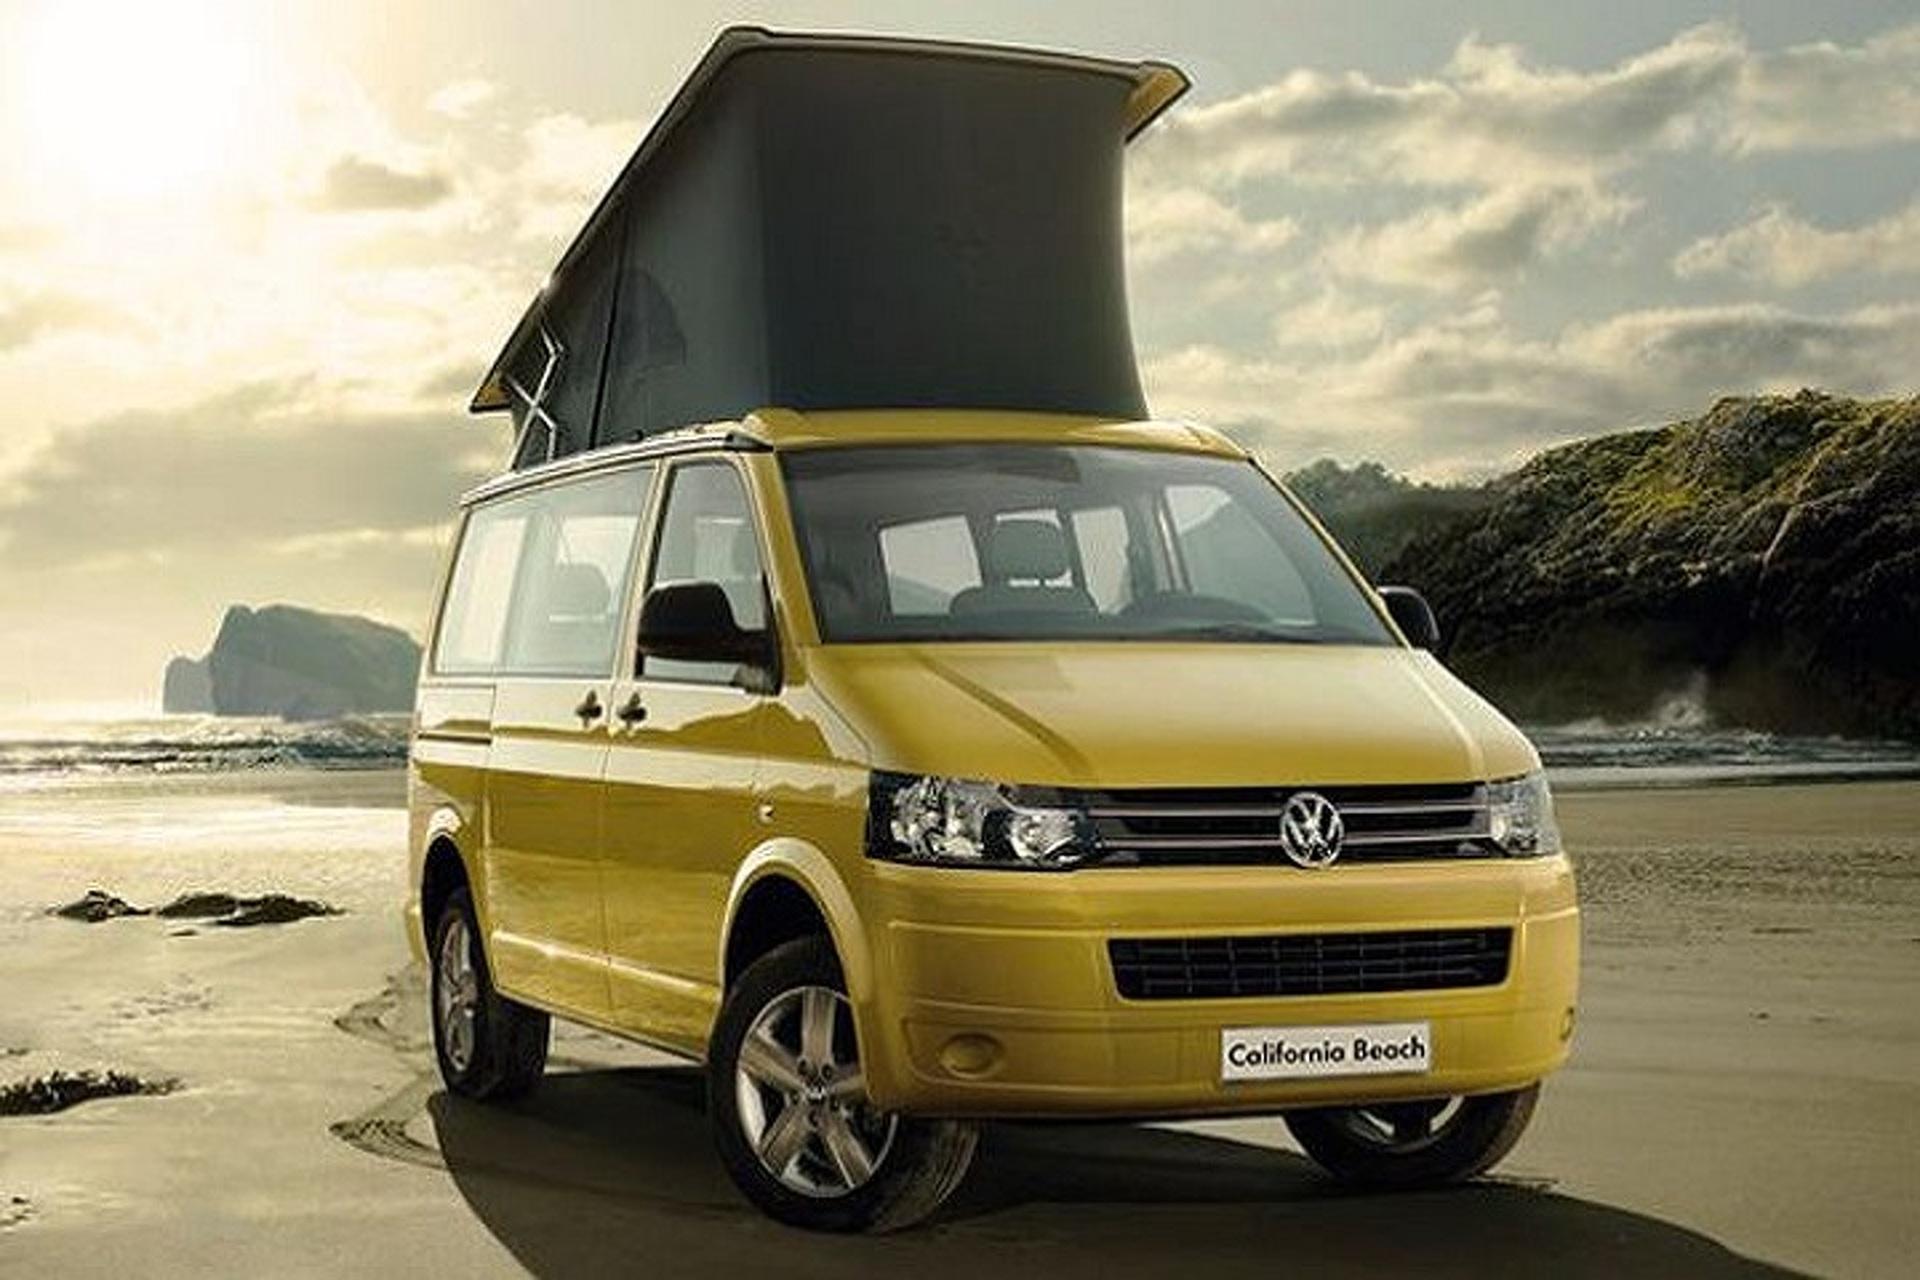 vw parts volkswagen spare camper category crazy campervan bus you suppliers